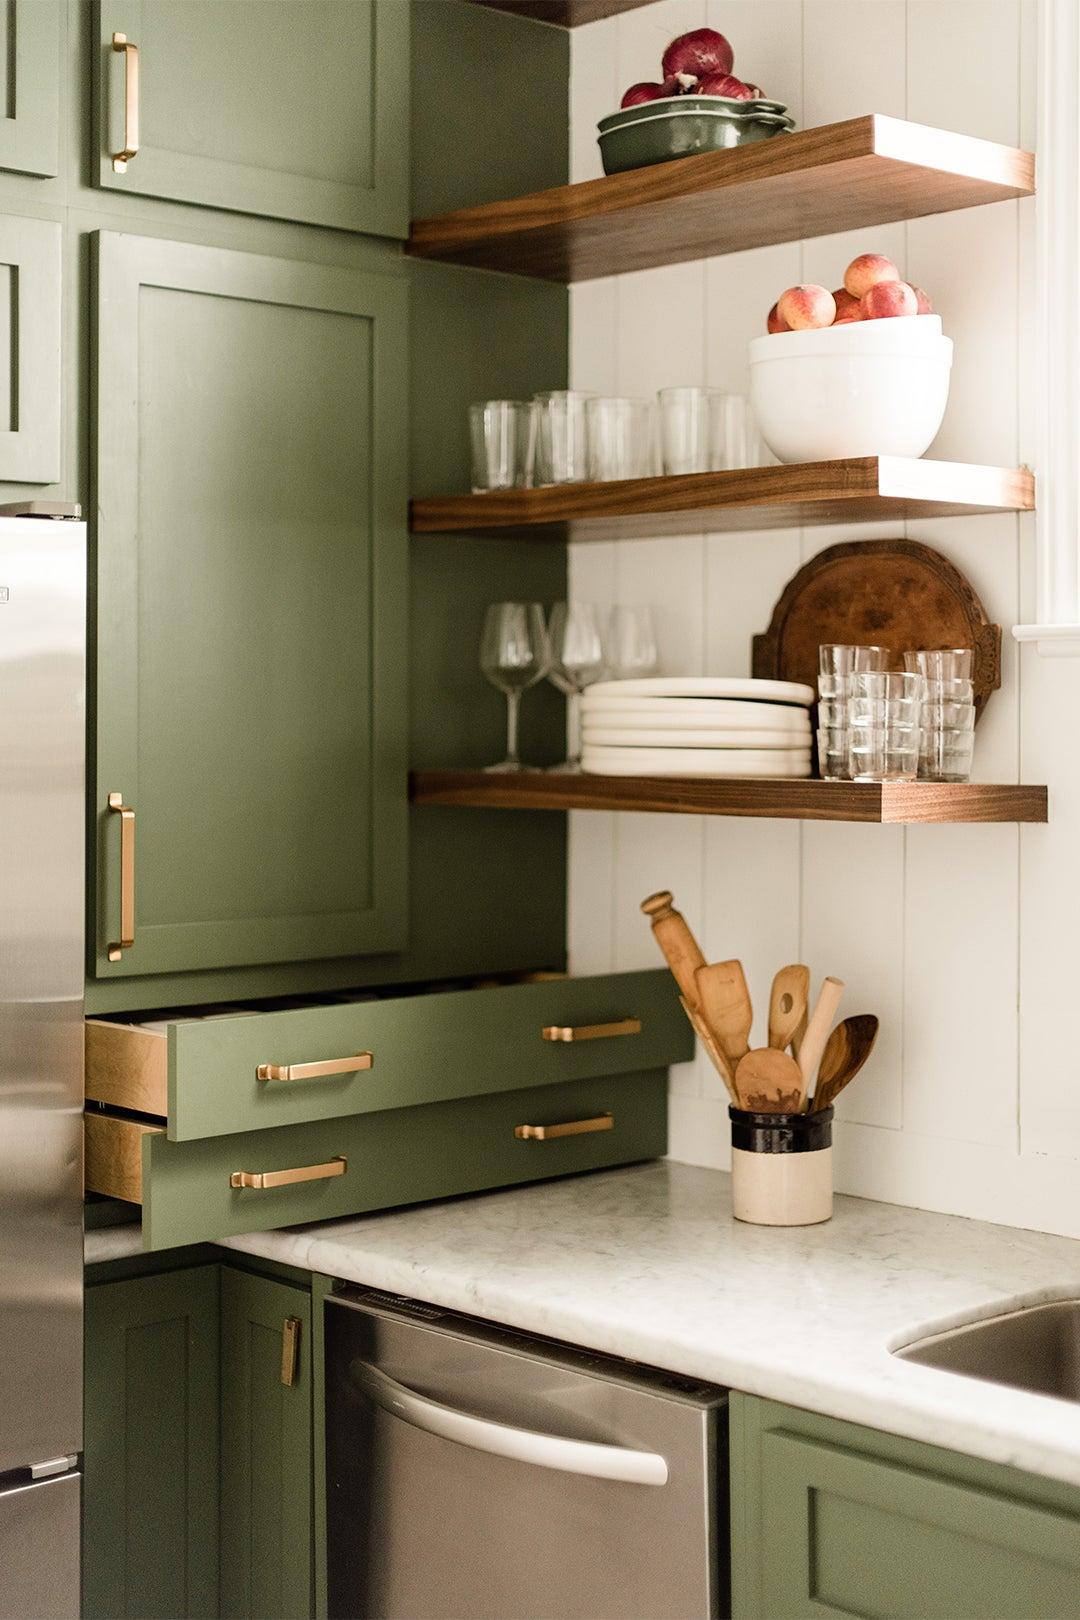 countertop drawers open